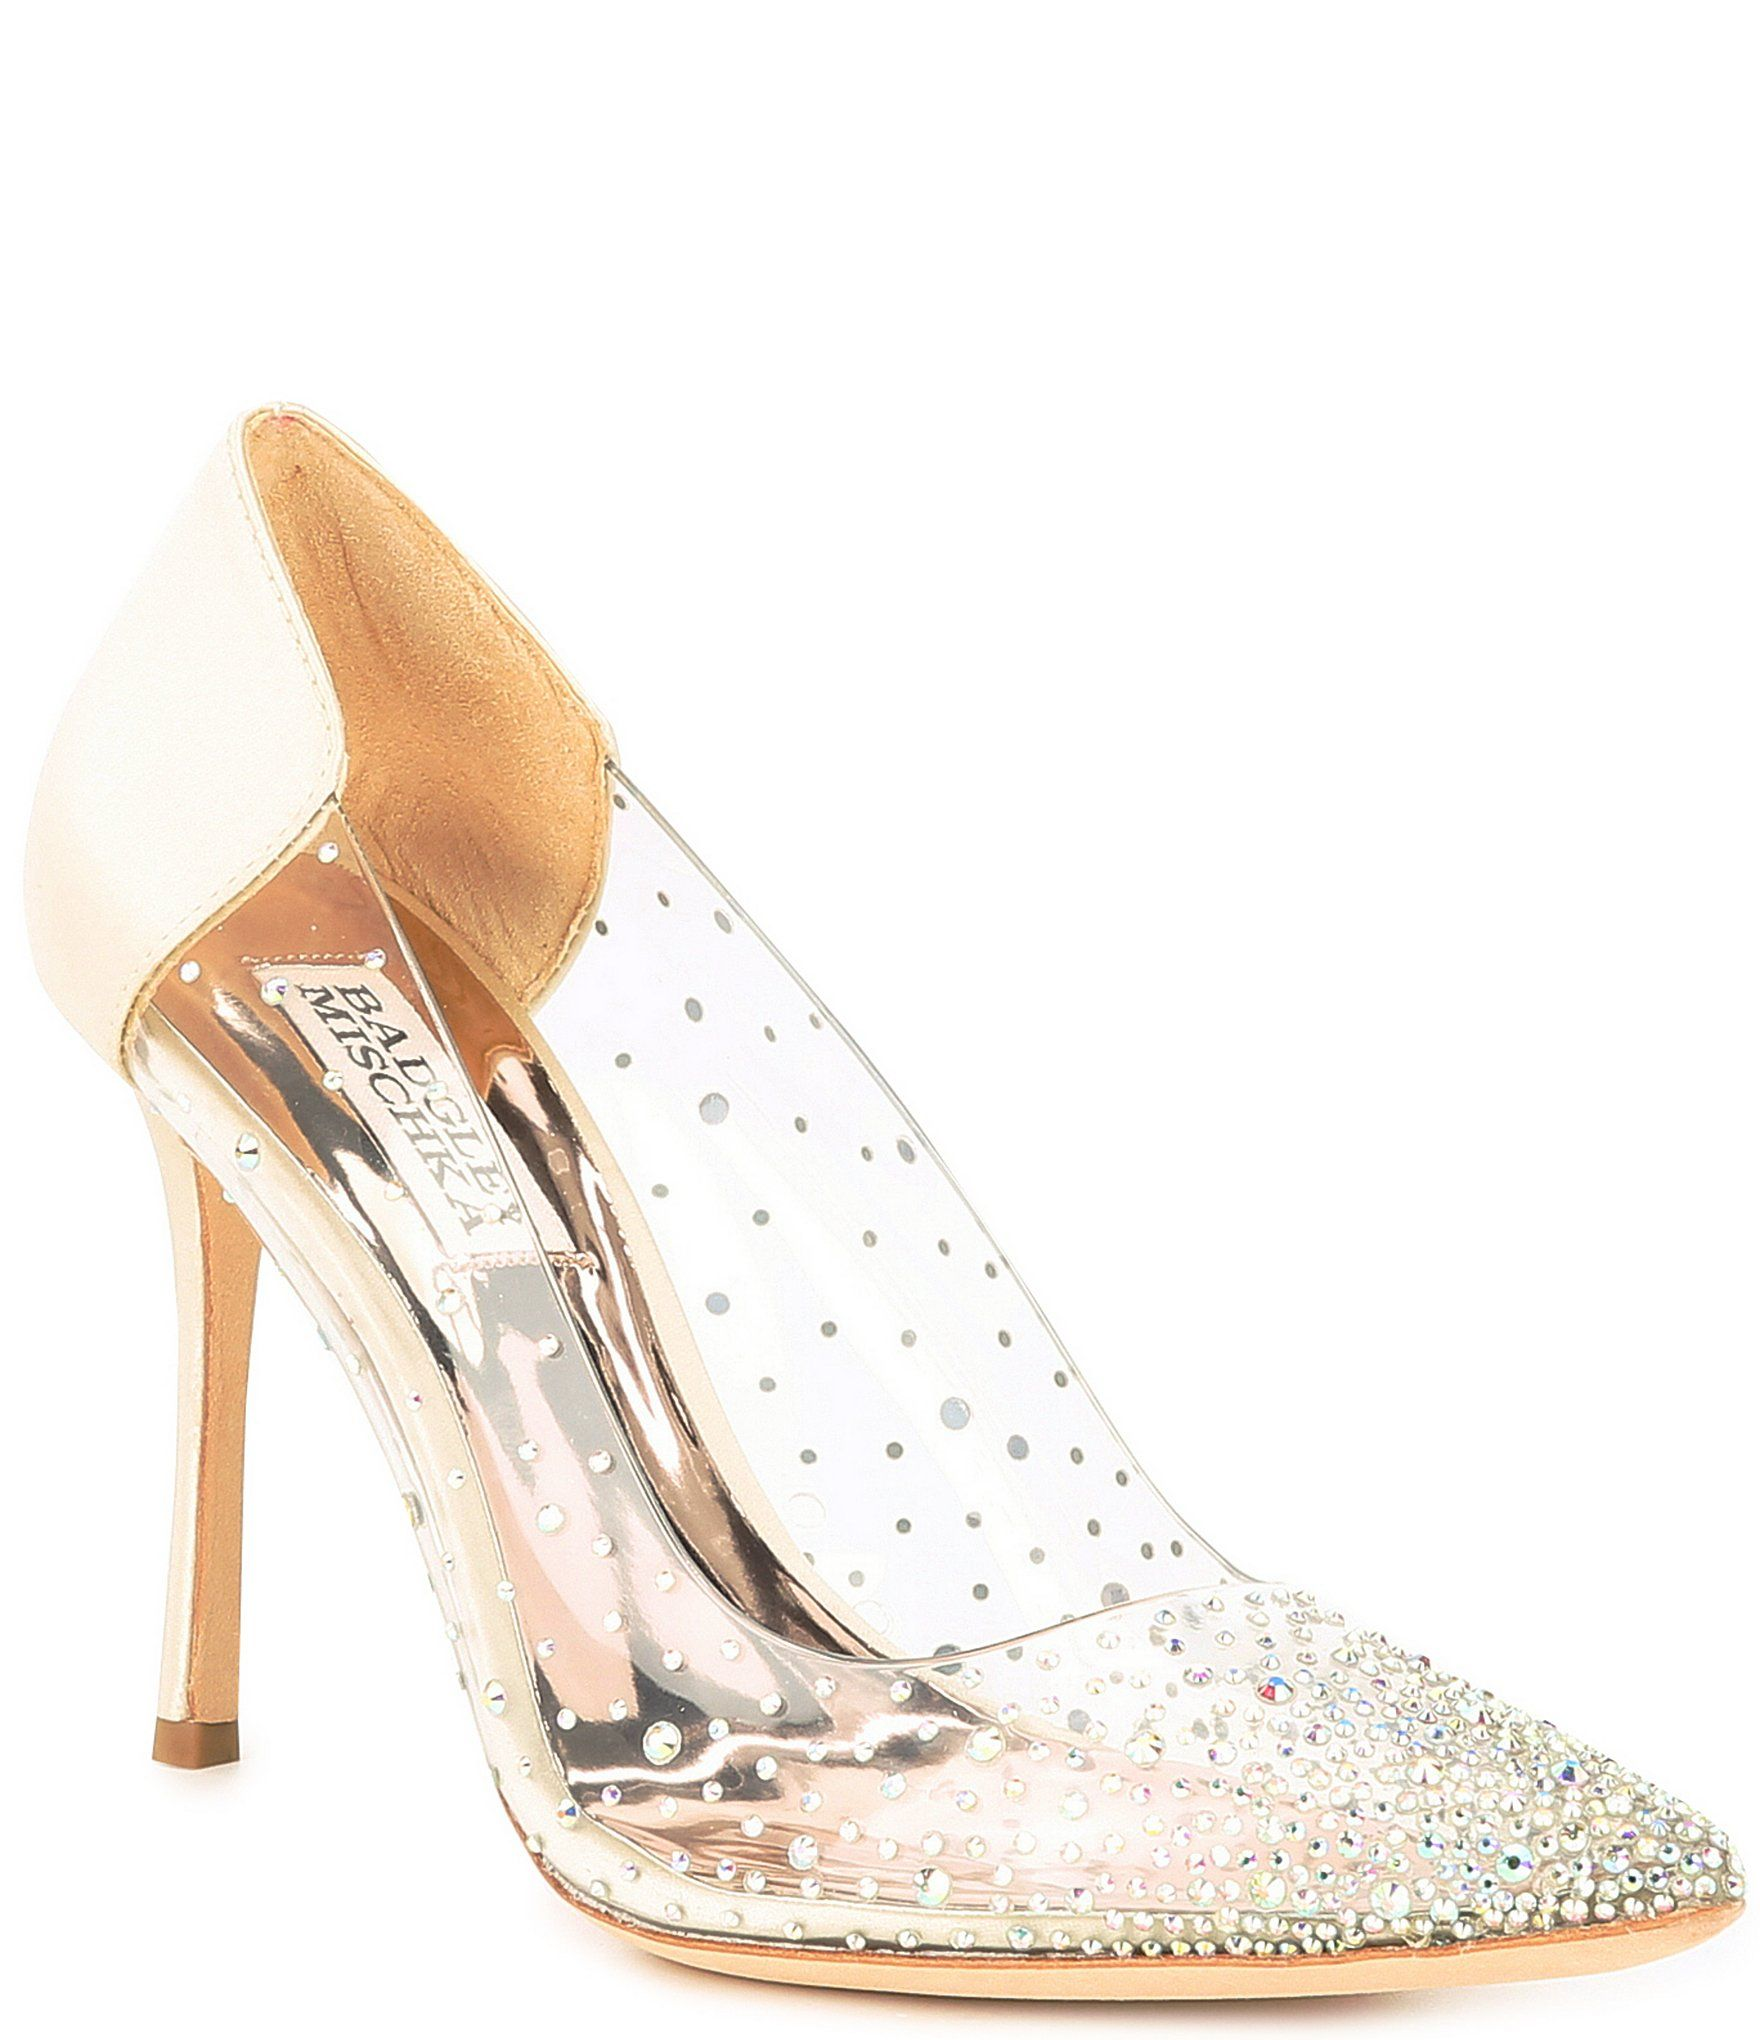 Badgley Mischka Gisela Embellished Clear And Satin Pumps Dillard S In 2021 Badgley Mischka Shoes Wedding Satin Pumps Badgley Mischka